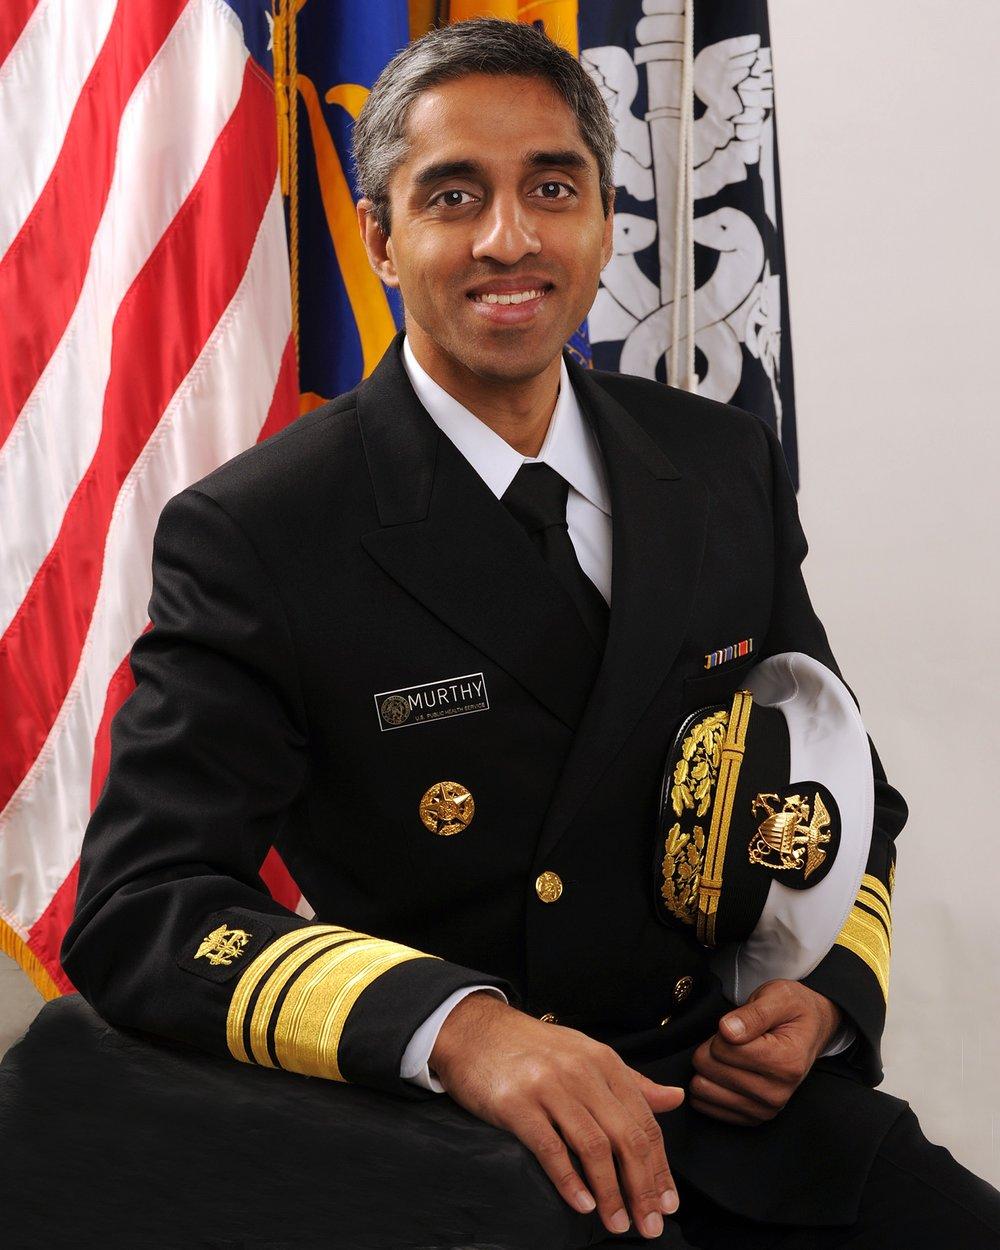 Surgeon General Vivek Murthy